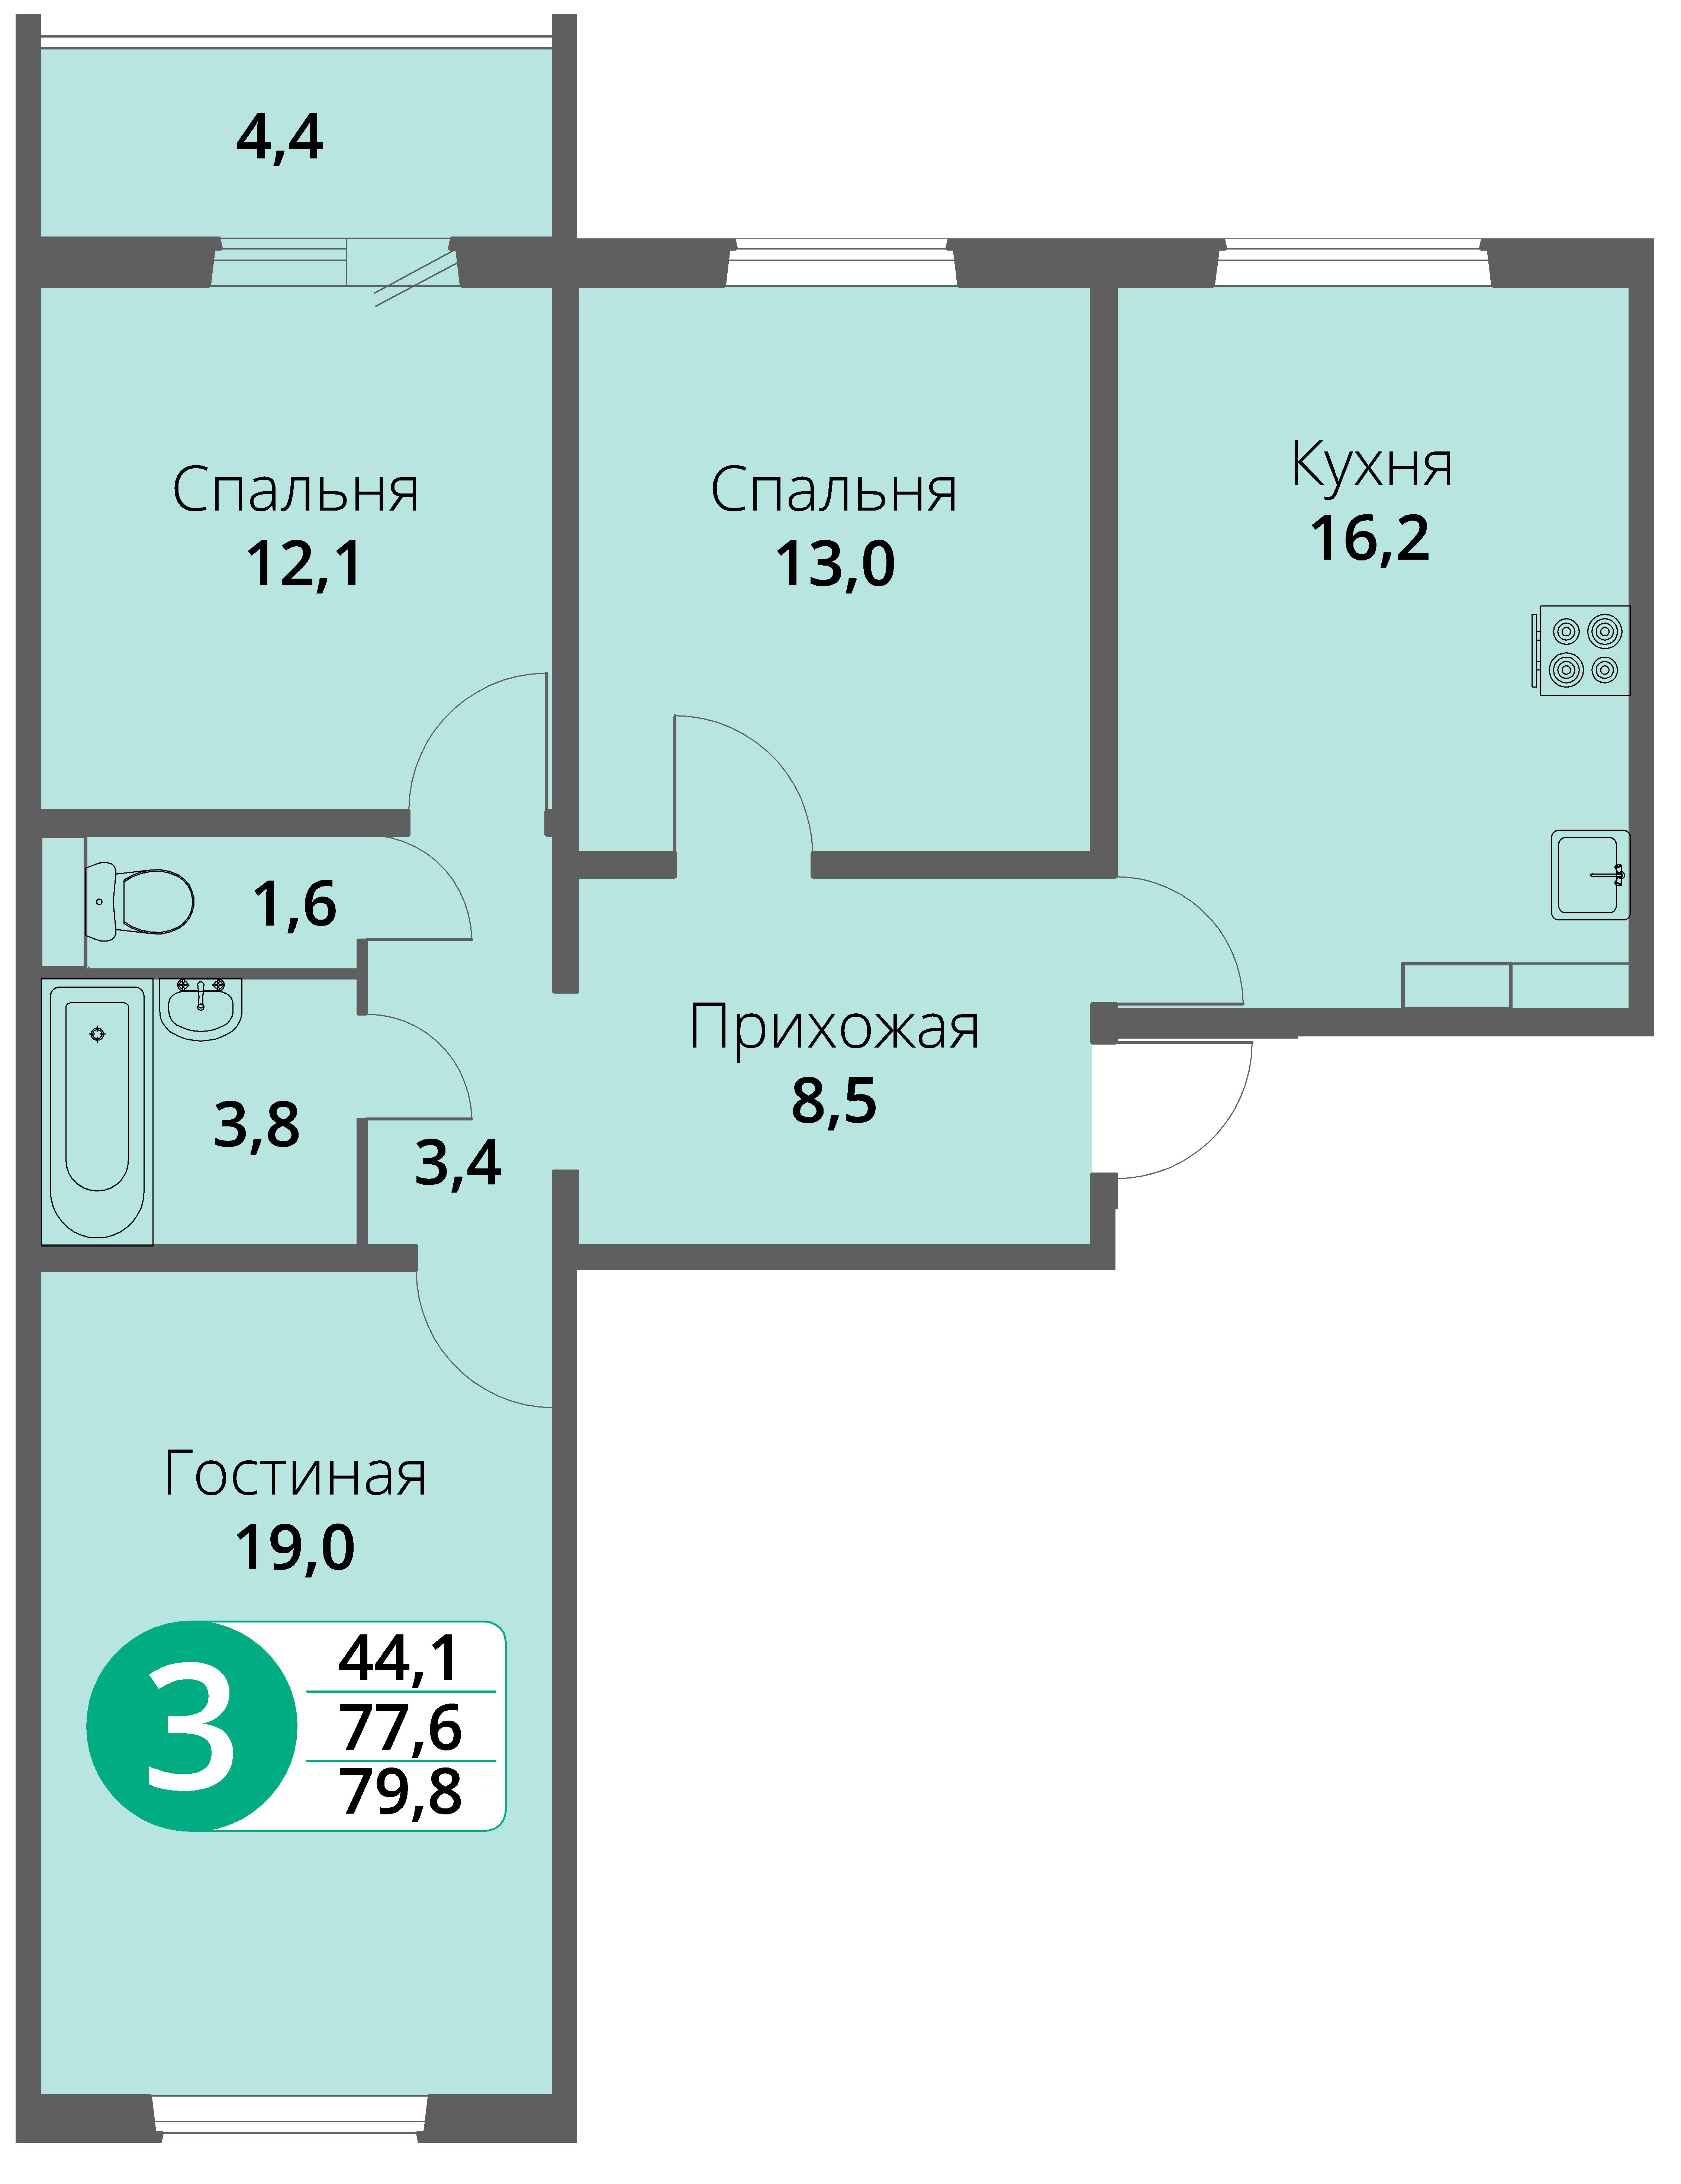 Зареченская 1-1, квартира 25 - Трехкомнатная